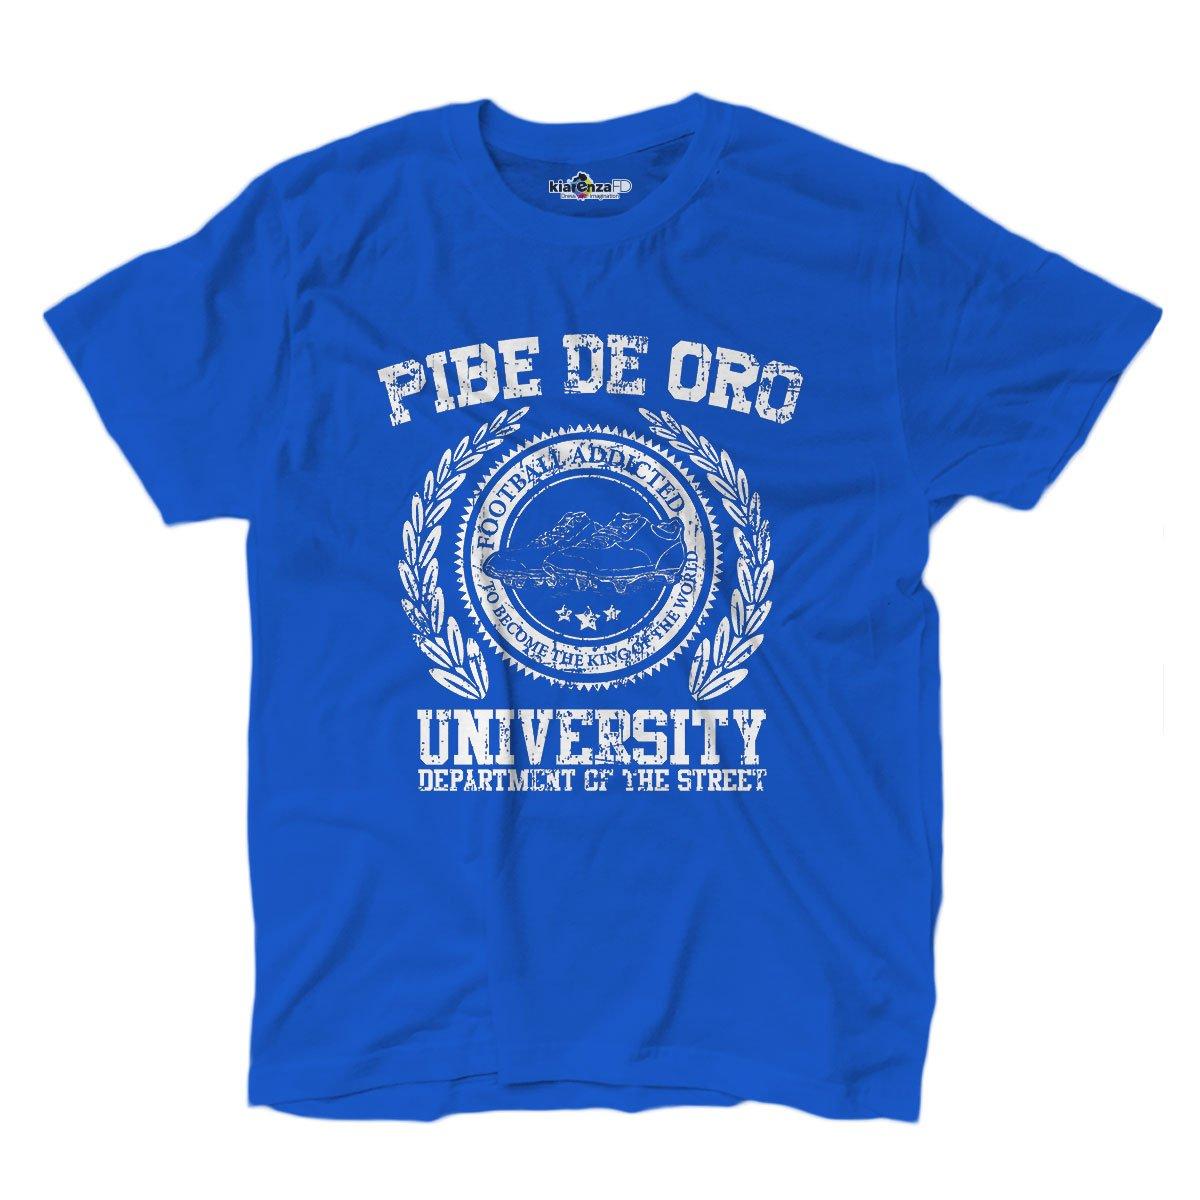 Camiseta camiseta fútbol Vita de Strada Pibe de Oro University Department of the: Amazon.es: Deportes y aire libre